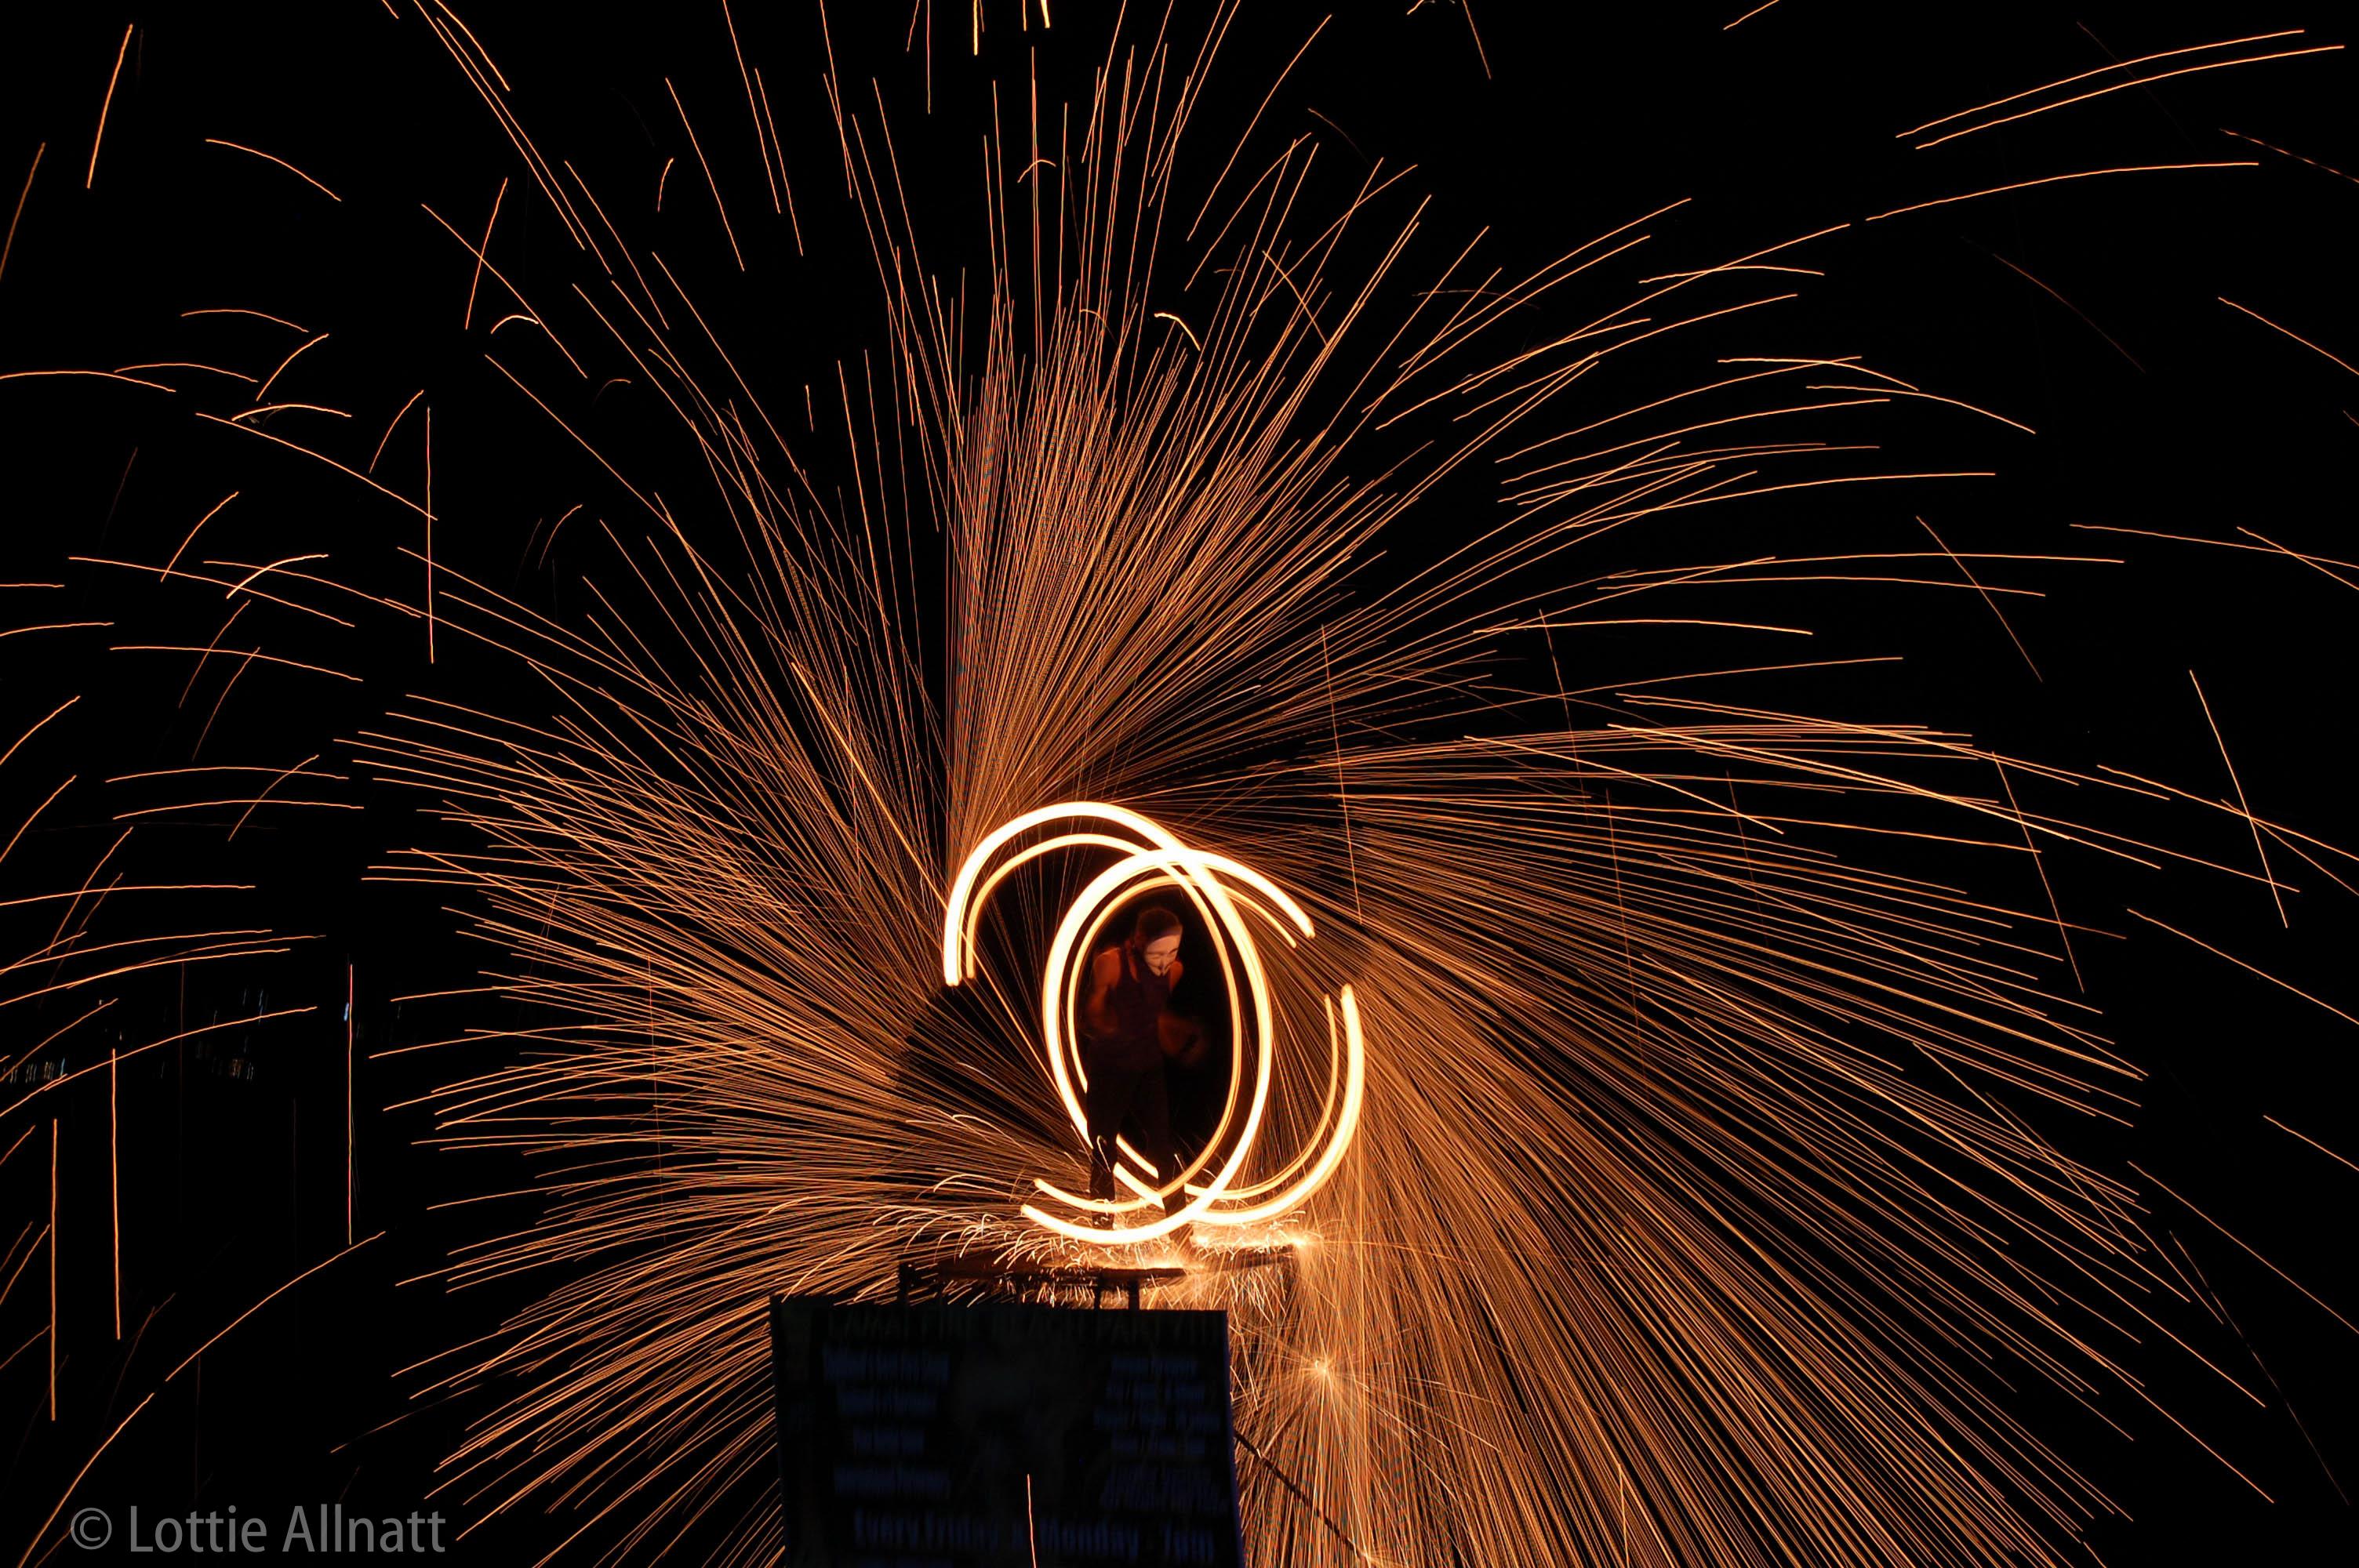 Fire show Lottie Allnatt Photography